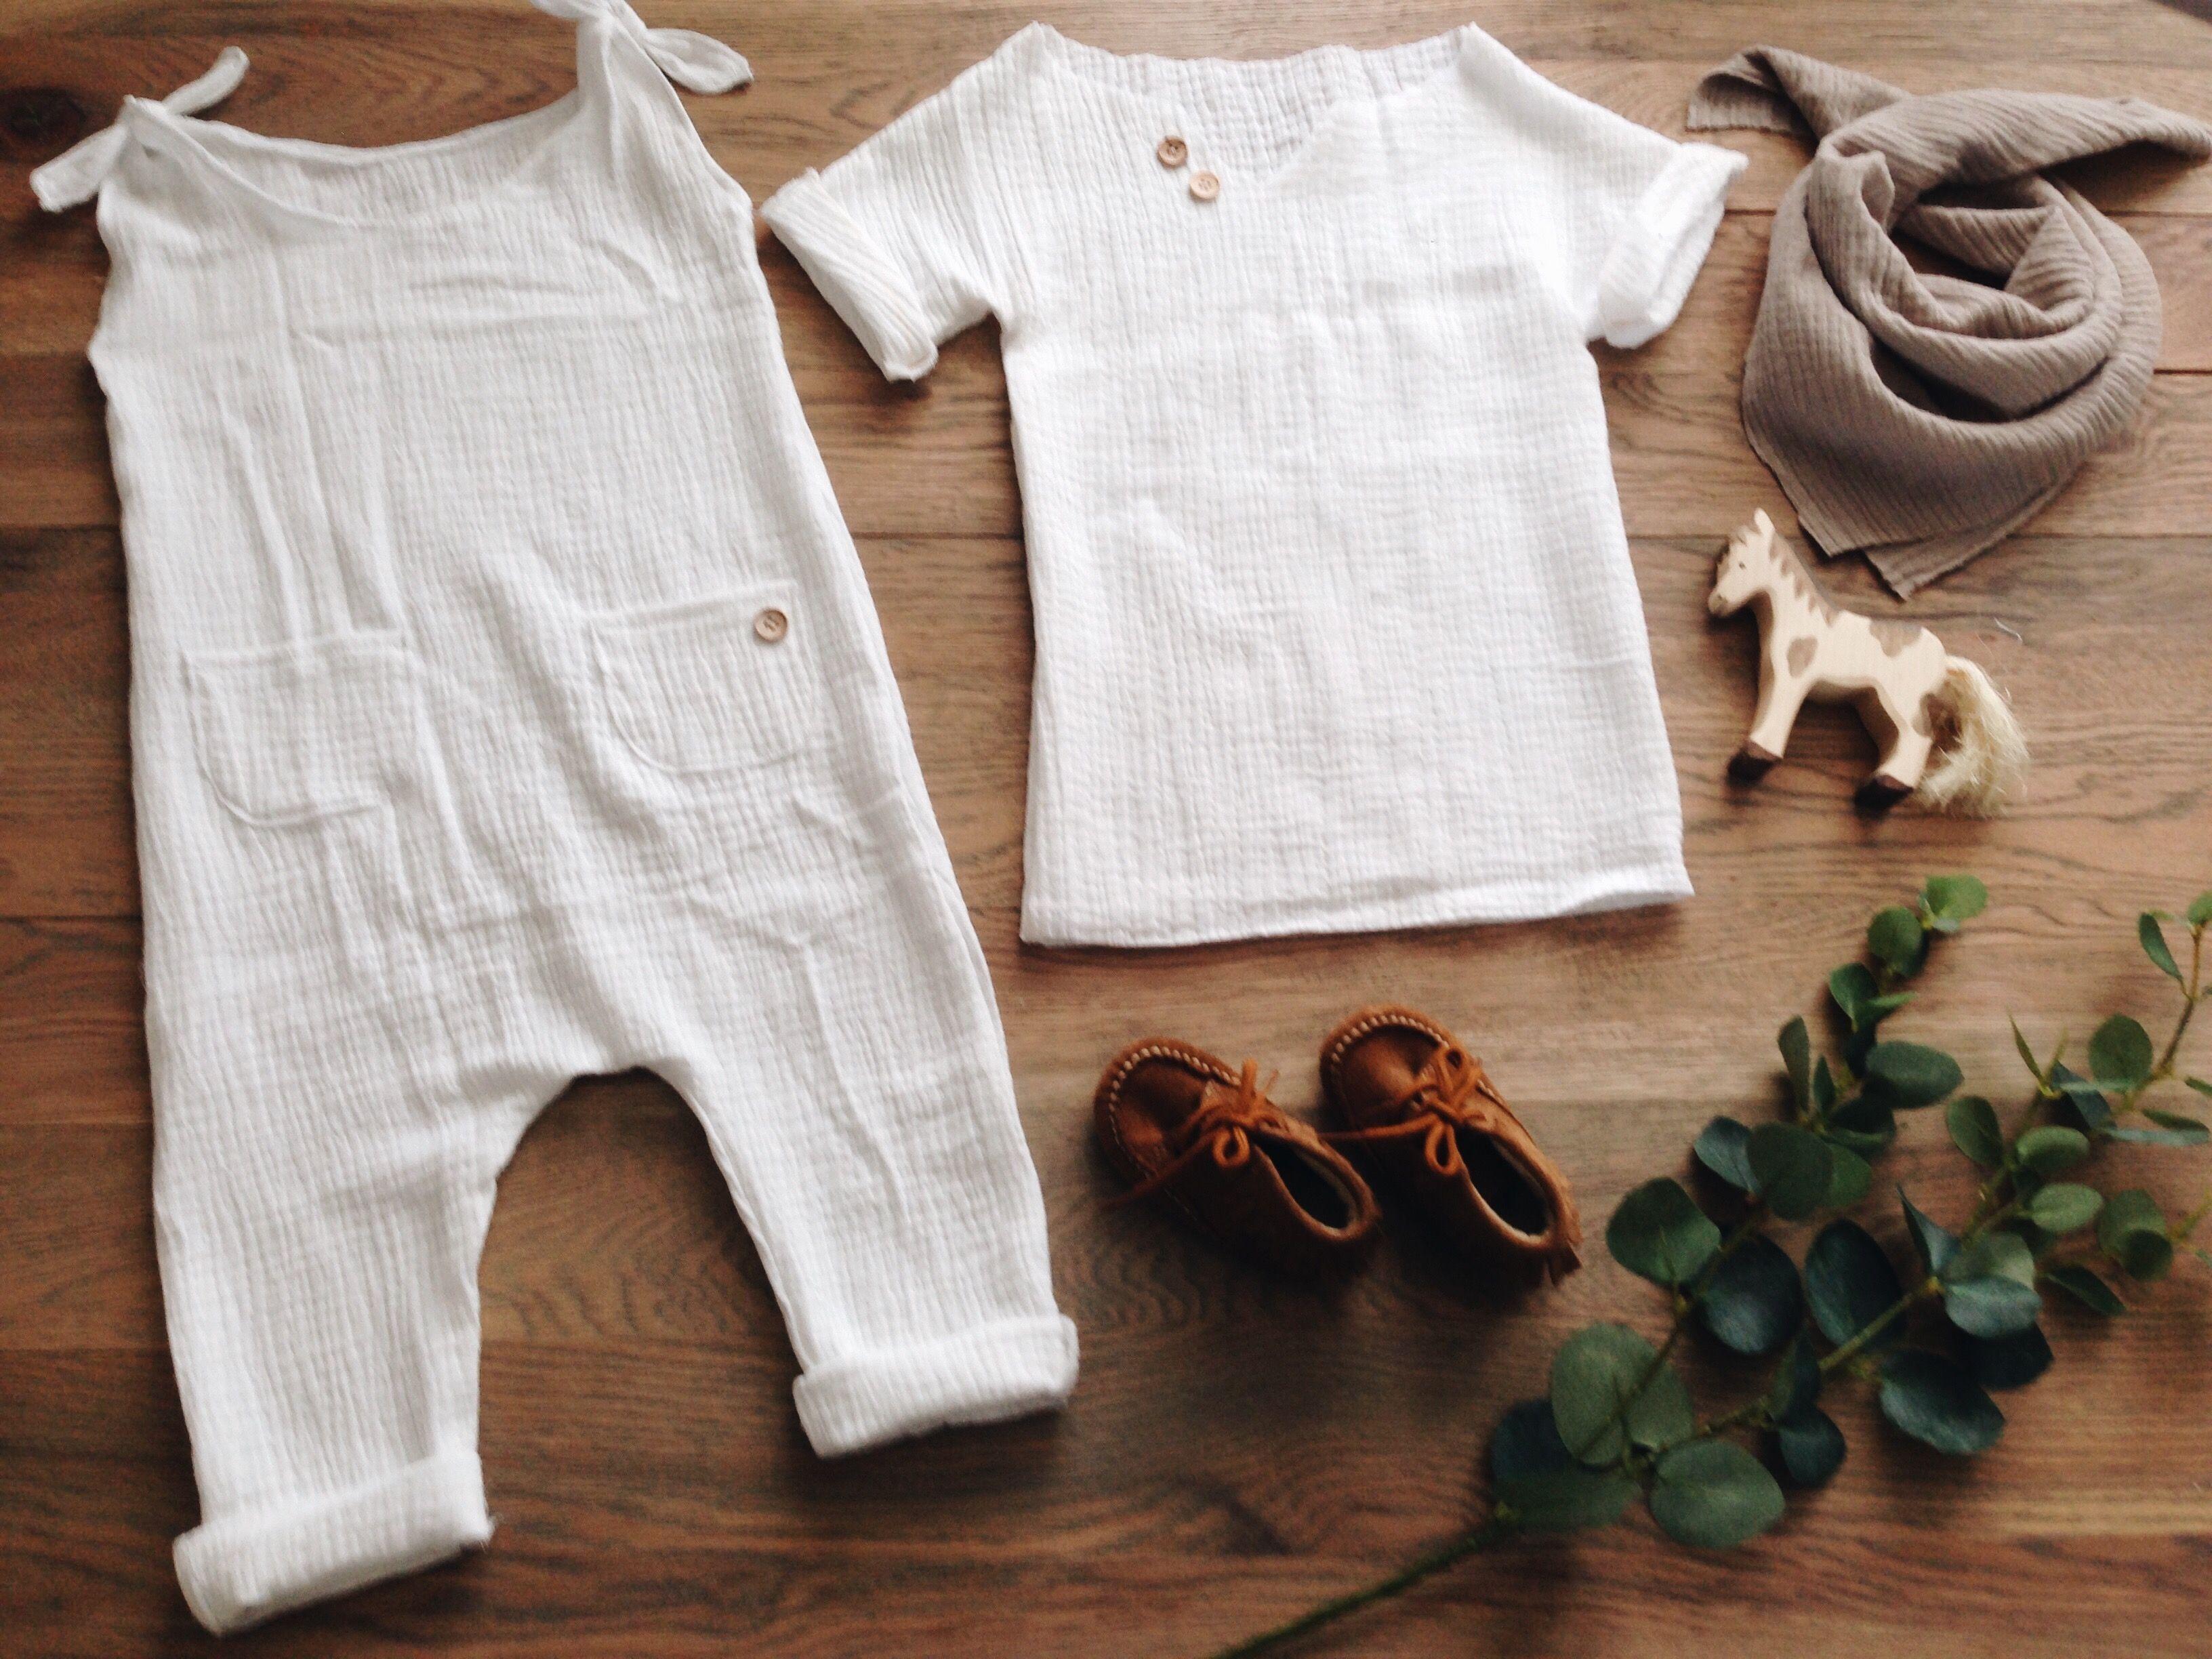 Musselin muslin Mull Overall junpsuit Strampler Shirt Baby nähen ...